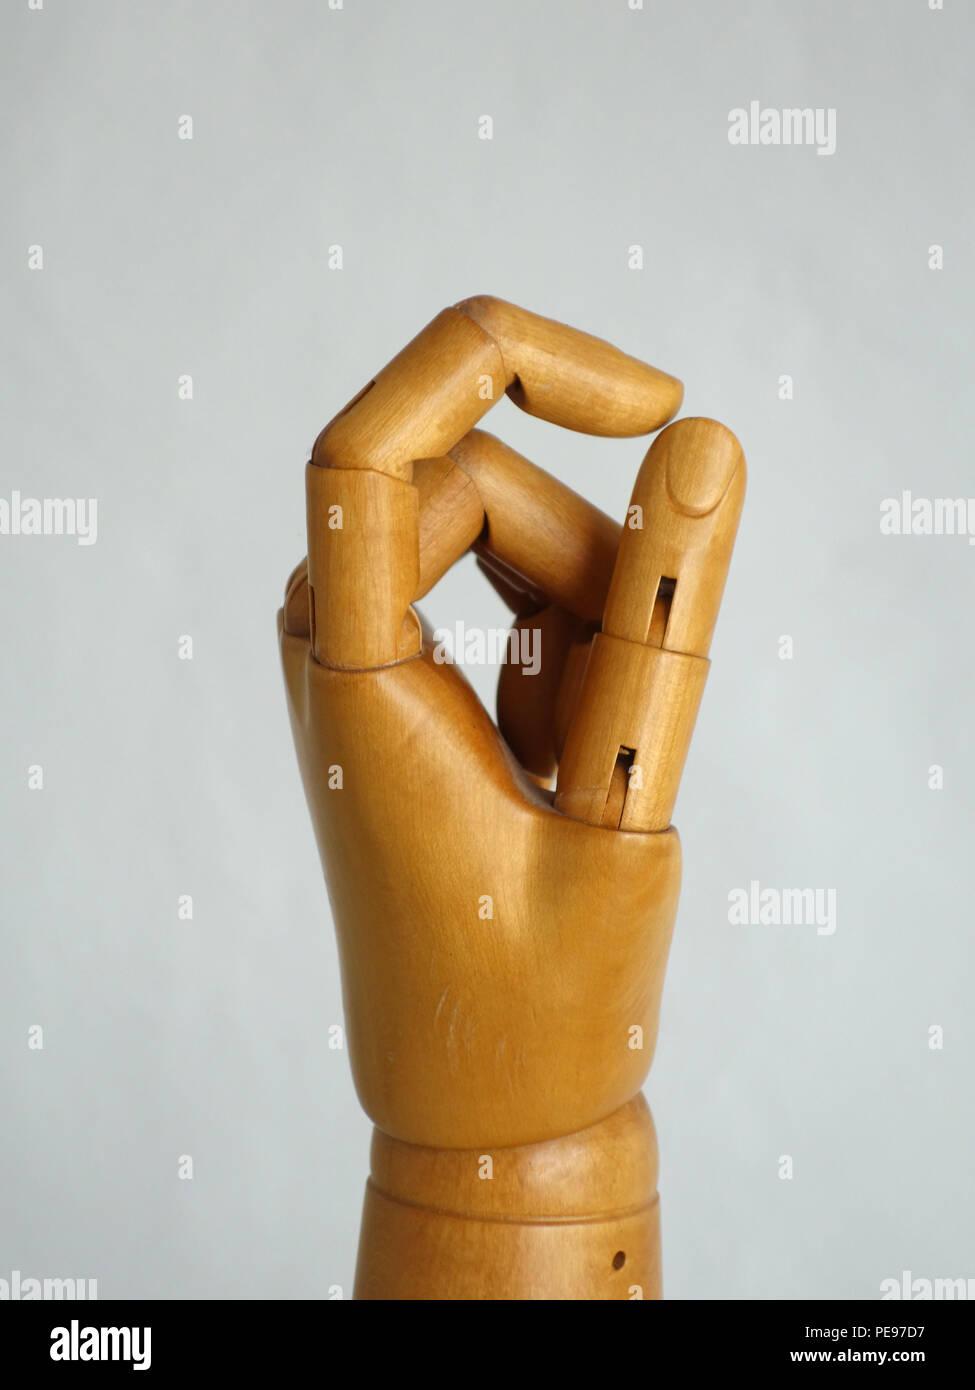 Wooden Hand Manikin making all good zero gestures Stock Photo